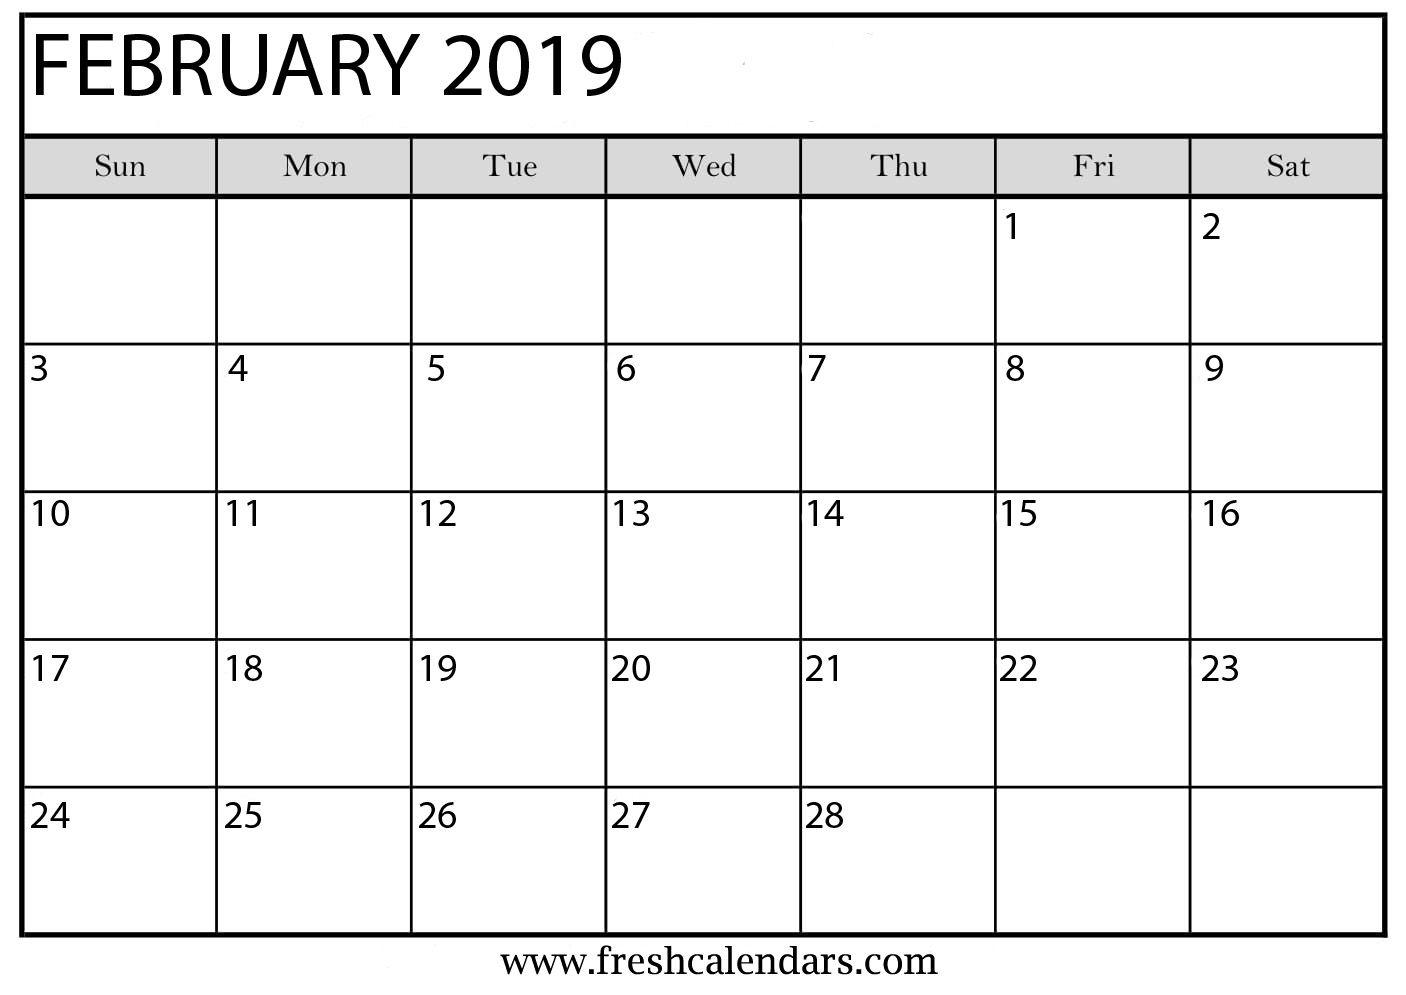 Calendar February 2019 Printable Template With Holidays Calendar